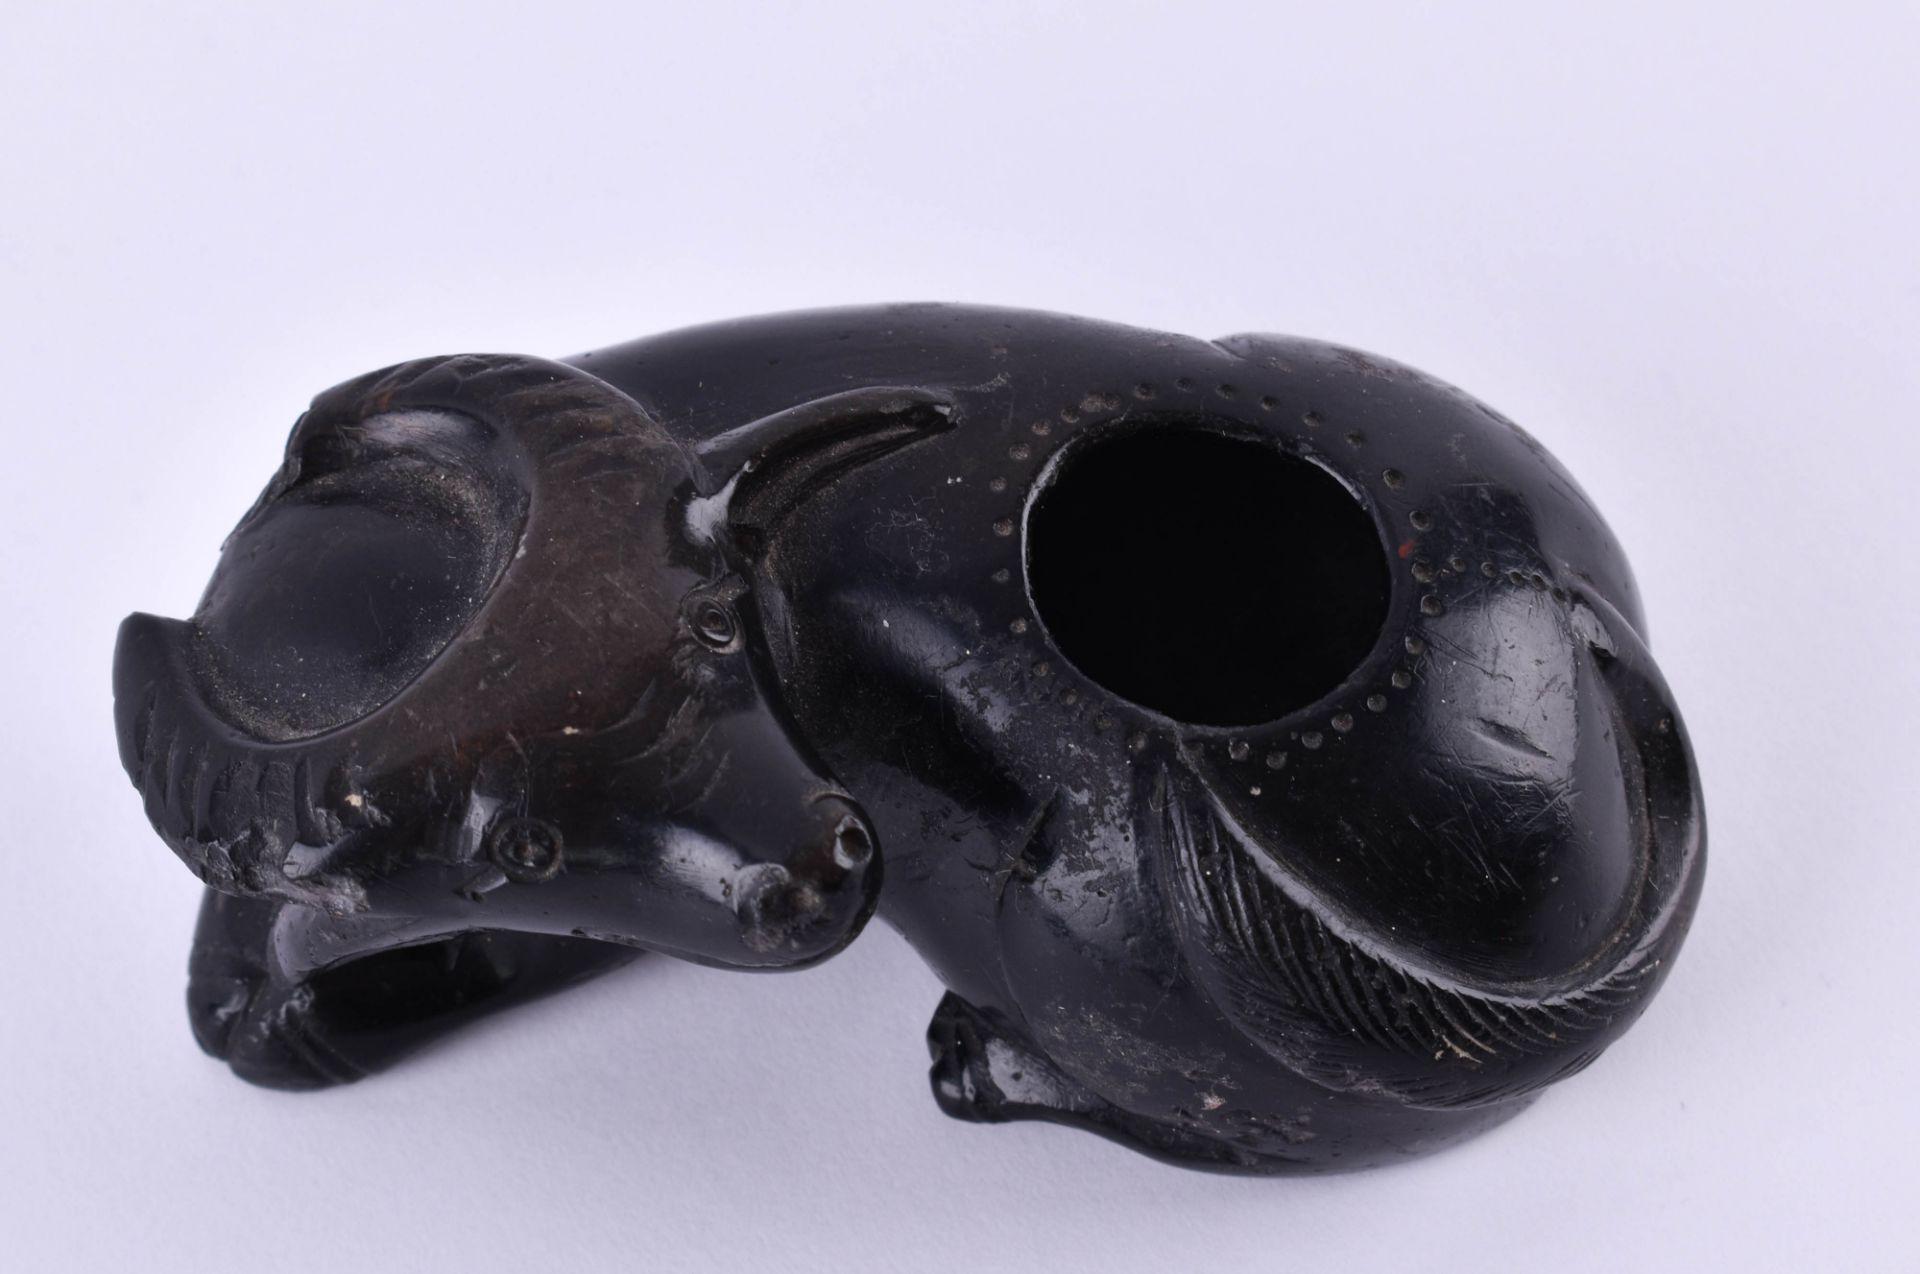 Ink bowl China Qing dynasty - Image 2 of 4